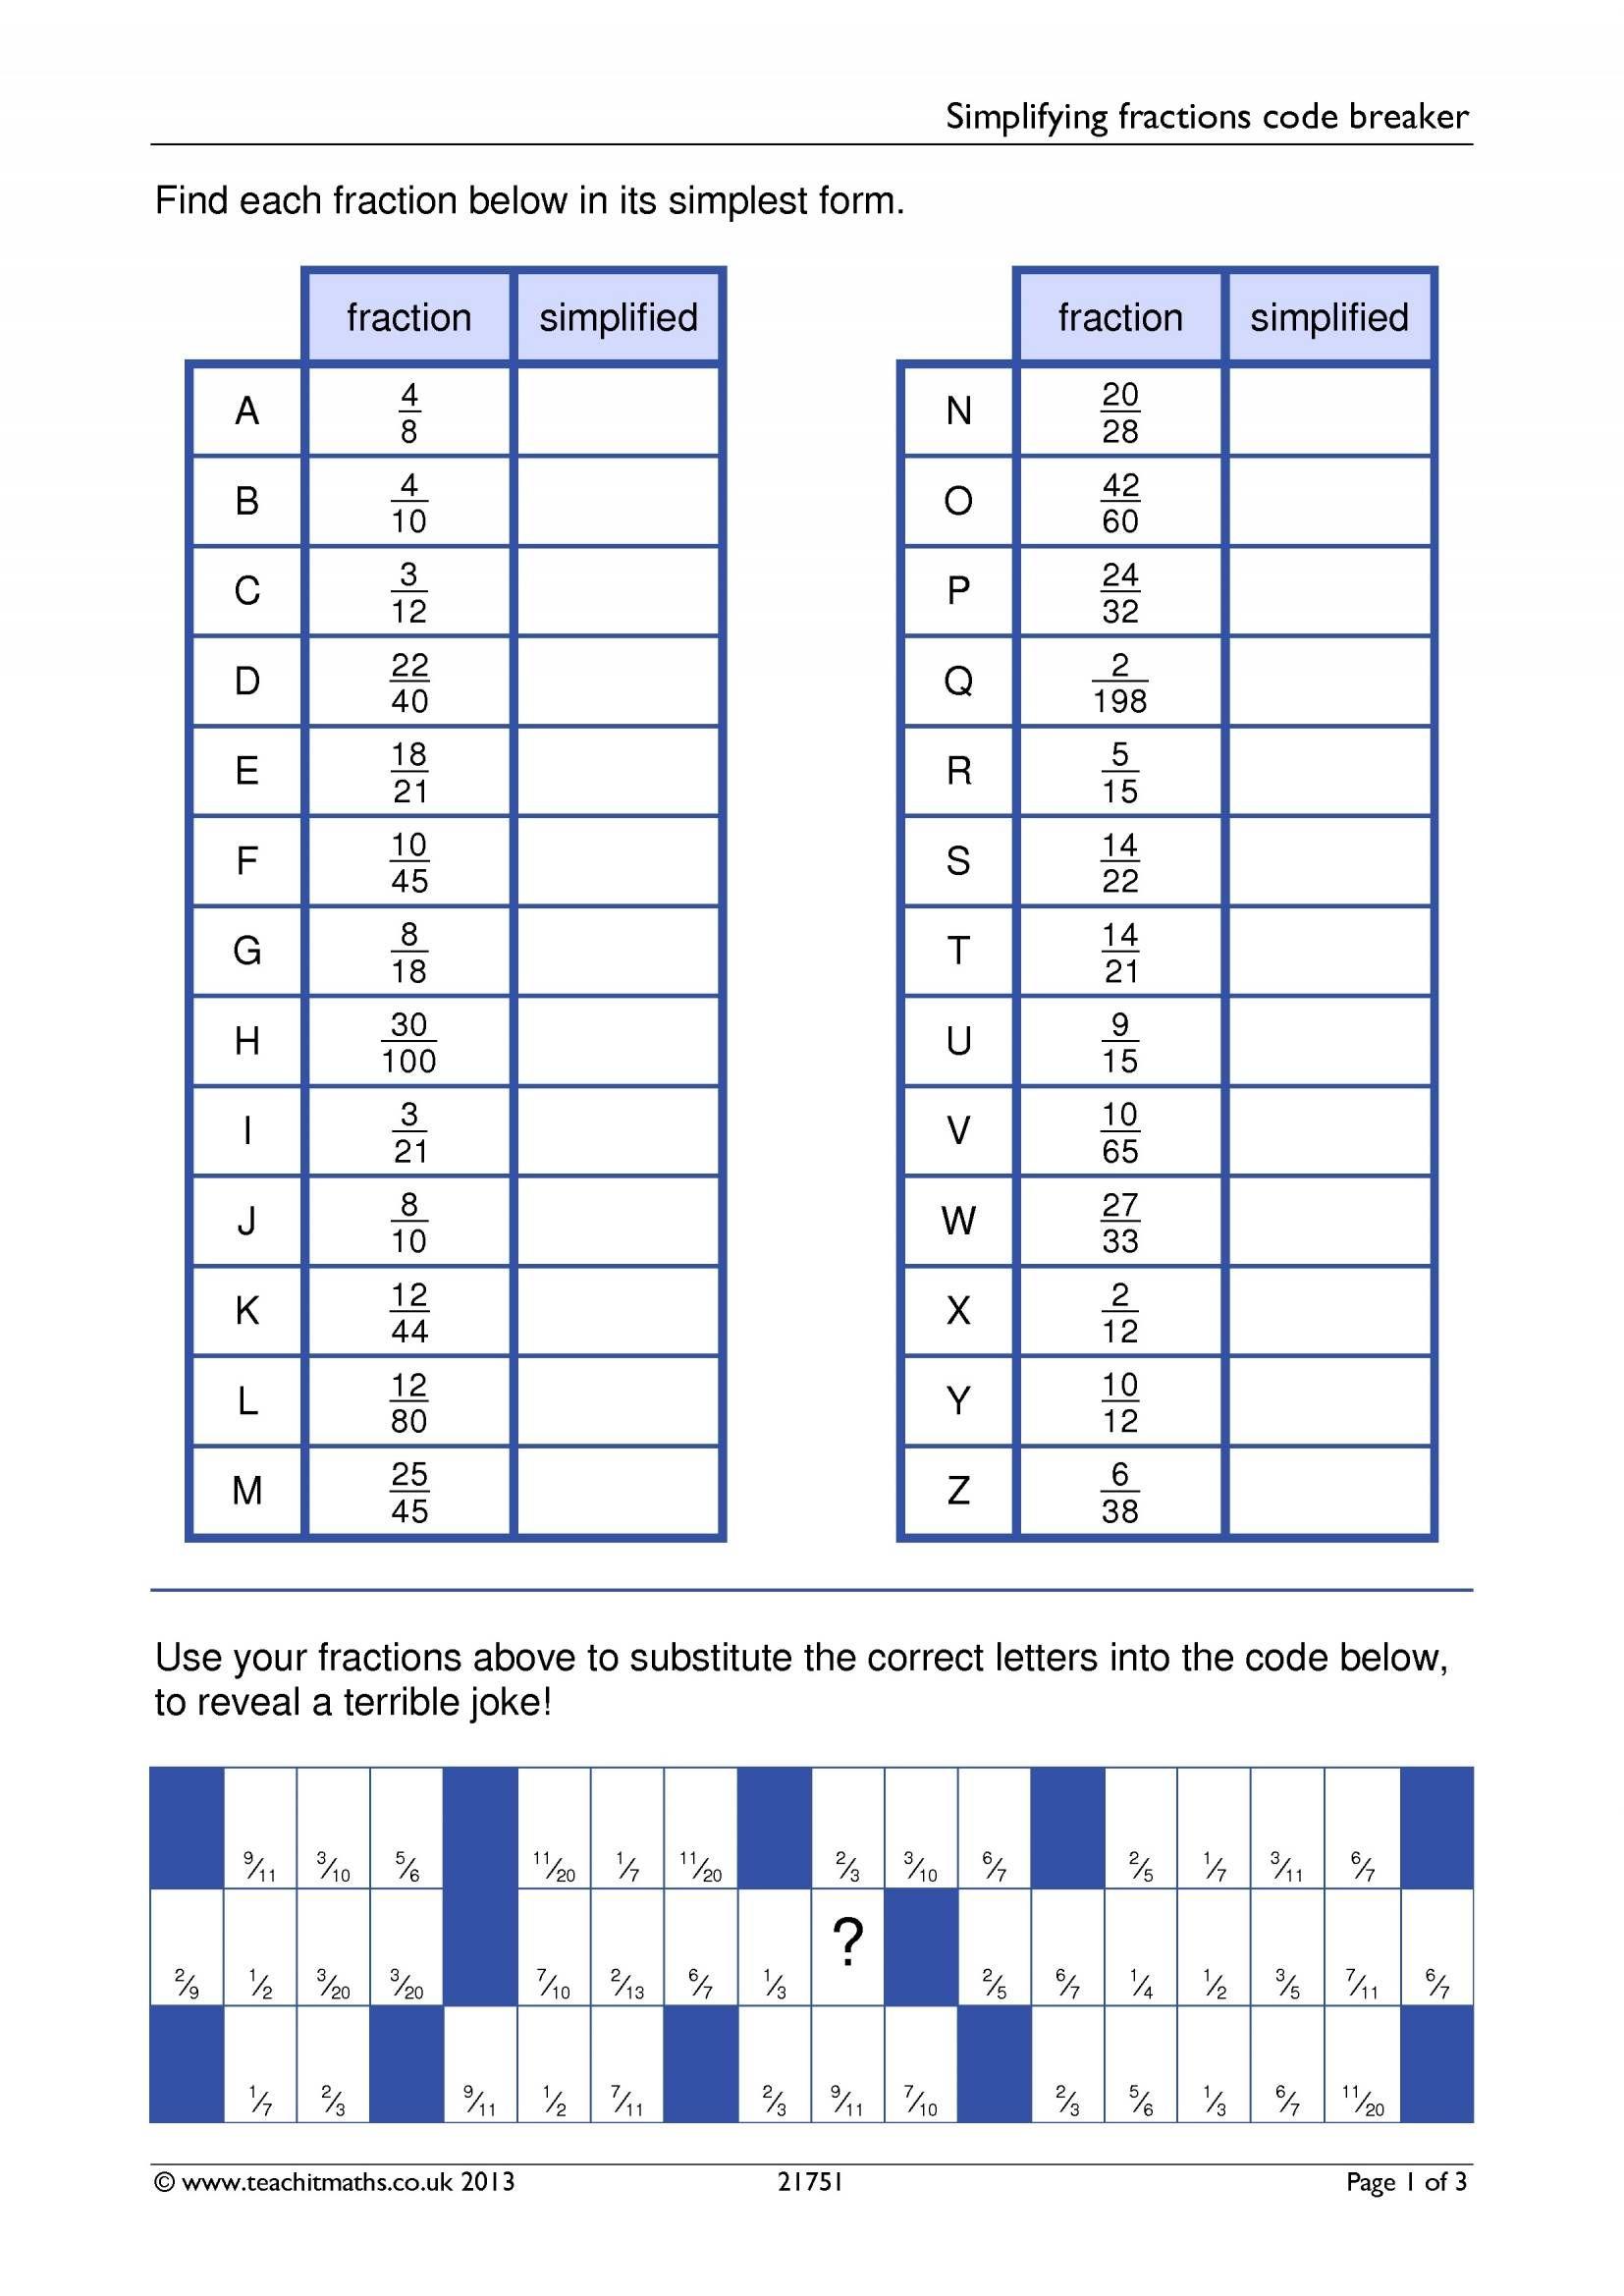 Simplifying Fractions Code Breaker